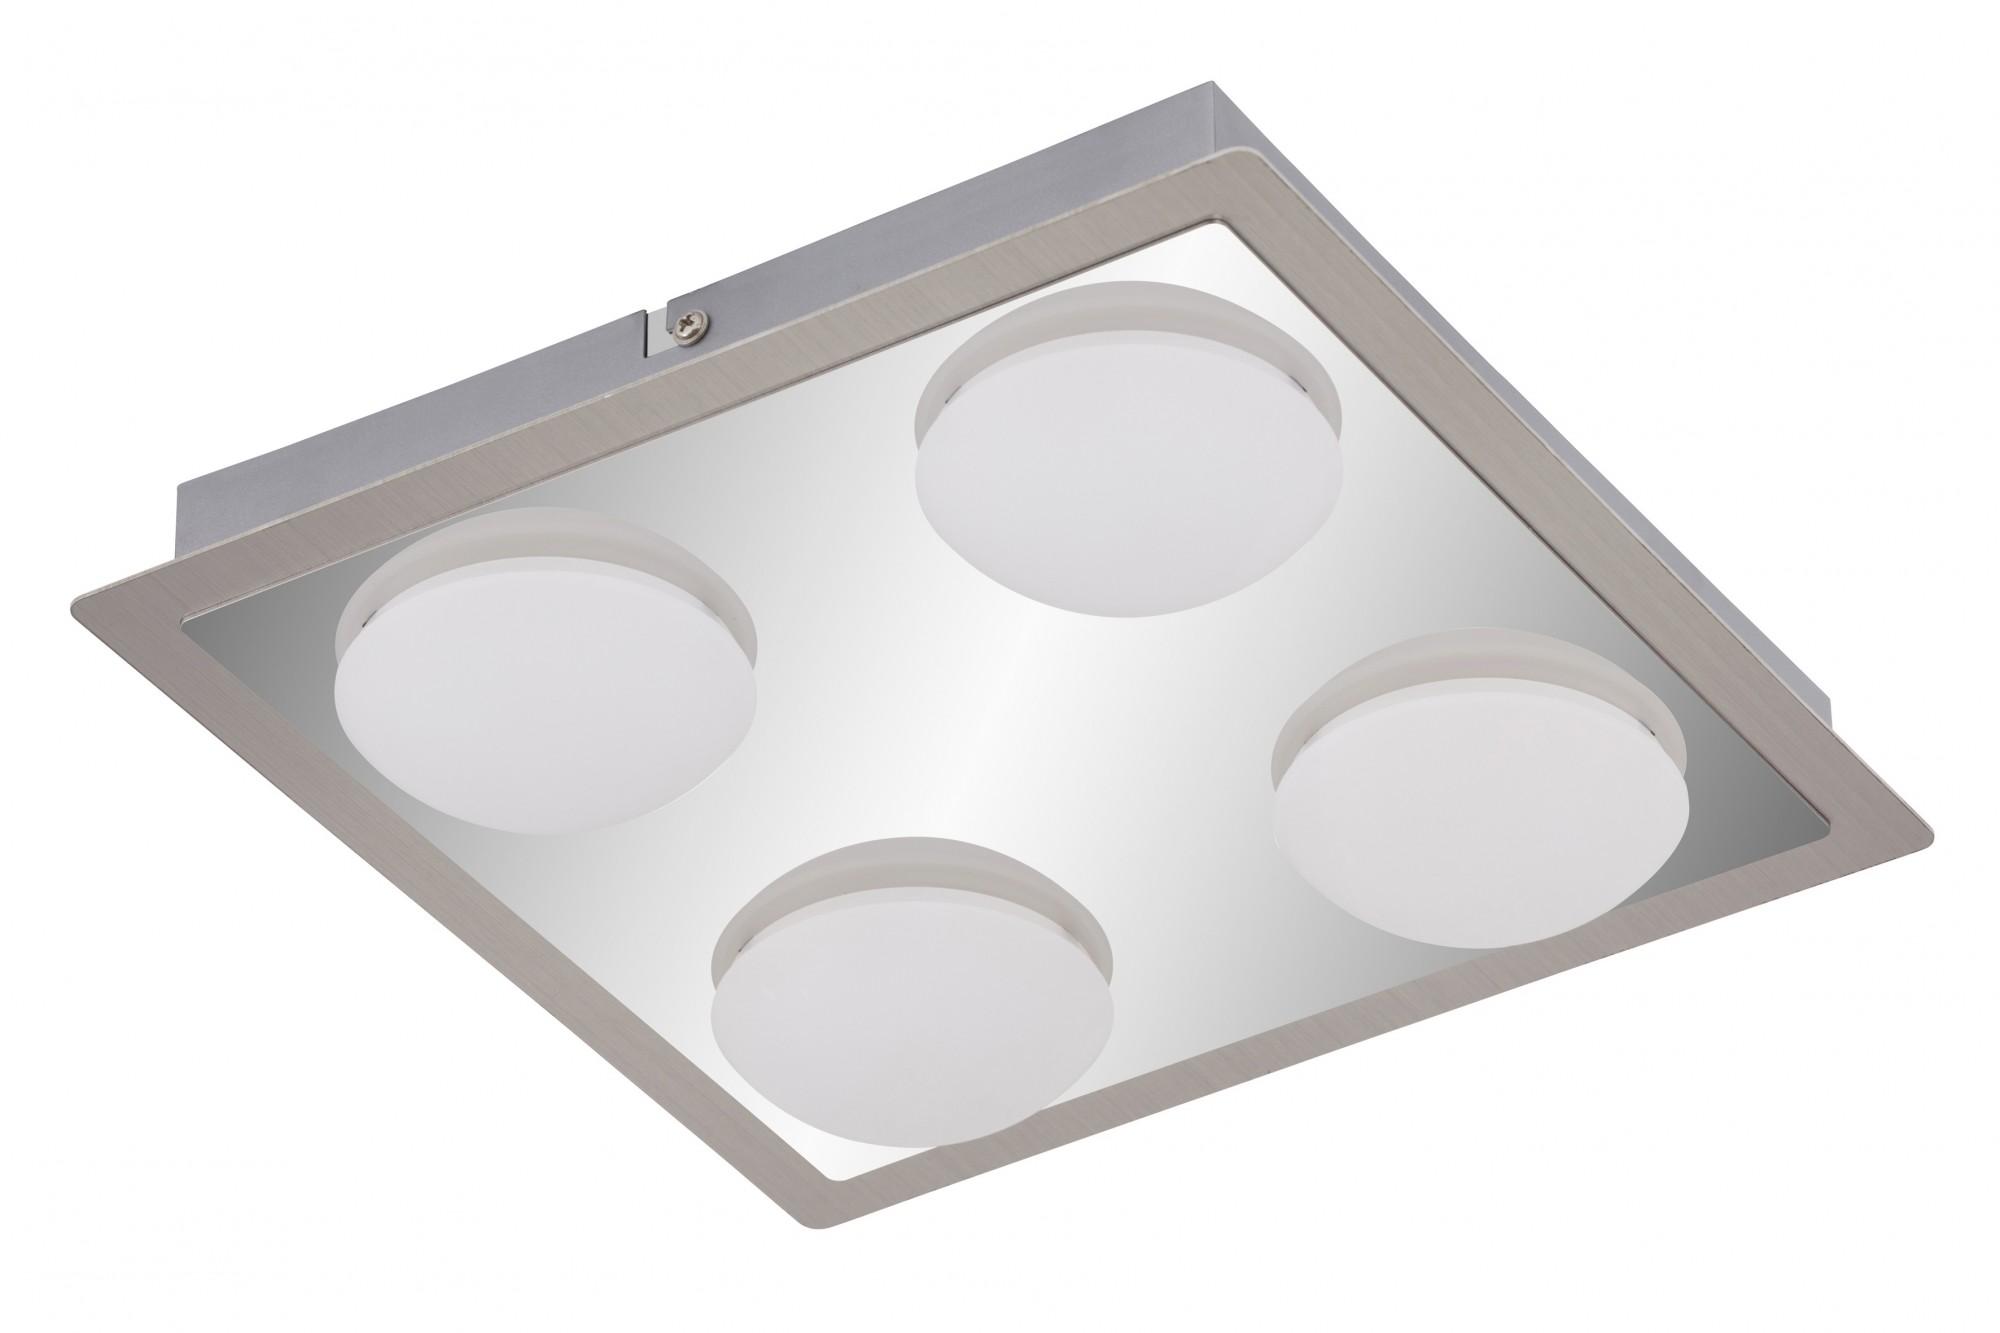 Led luce bagno lampada da soffitto cromo opaco nichel 4 fiamma